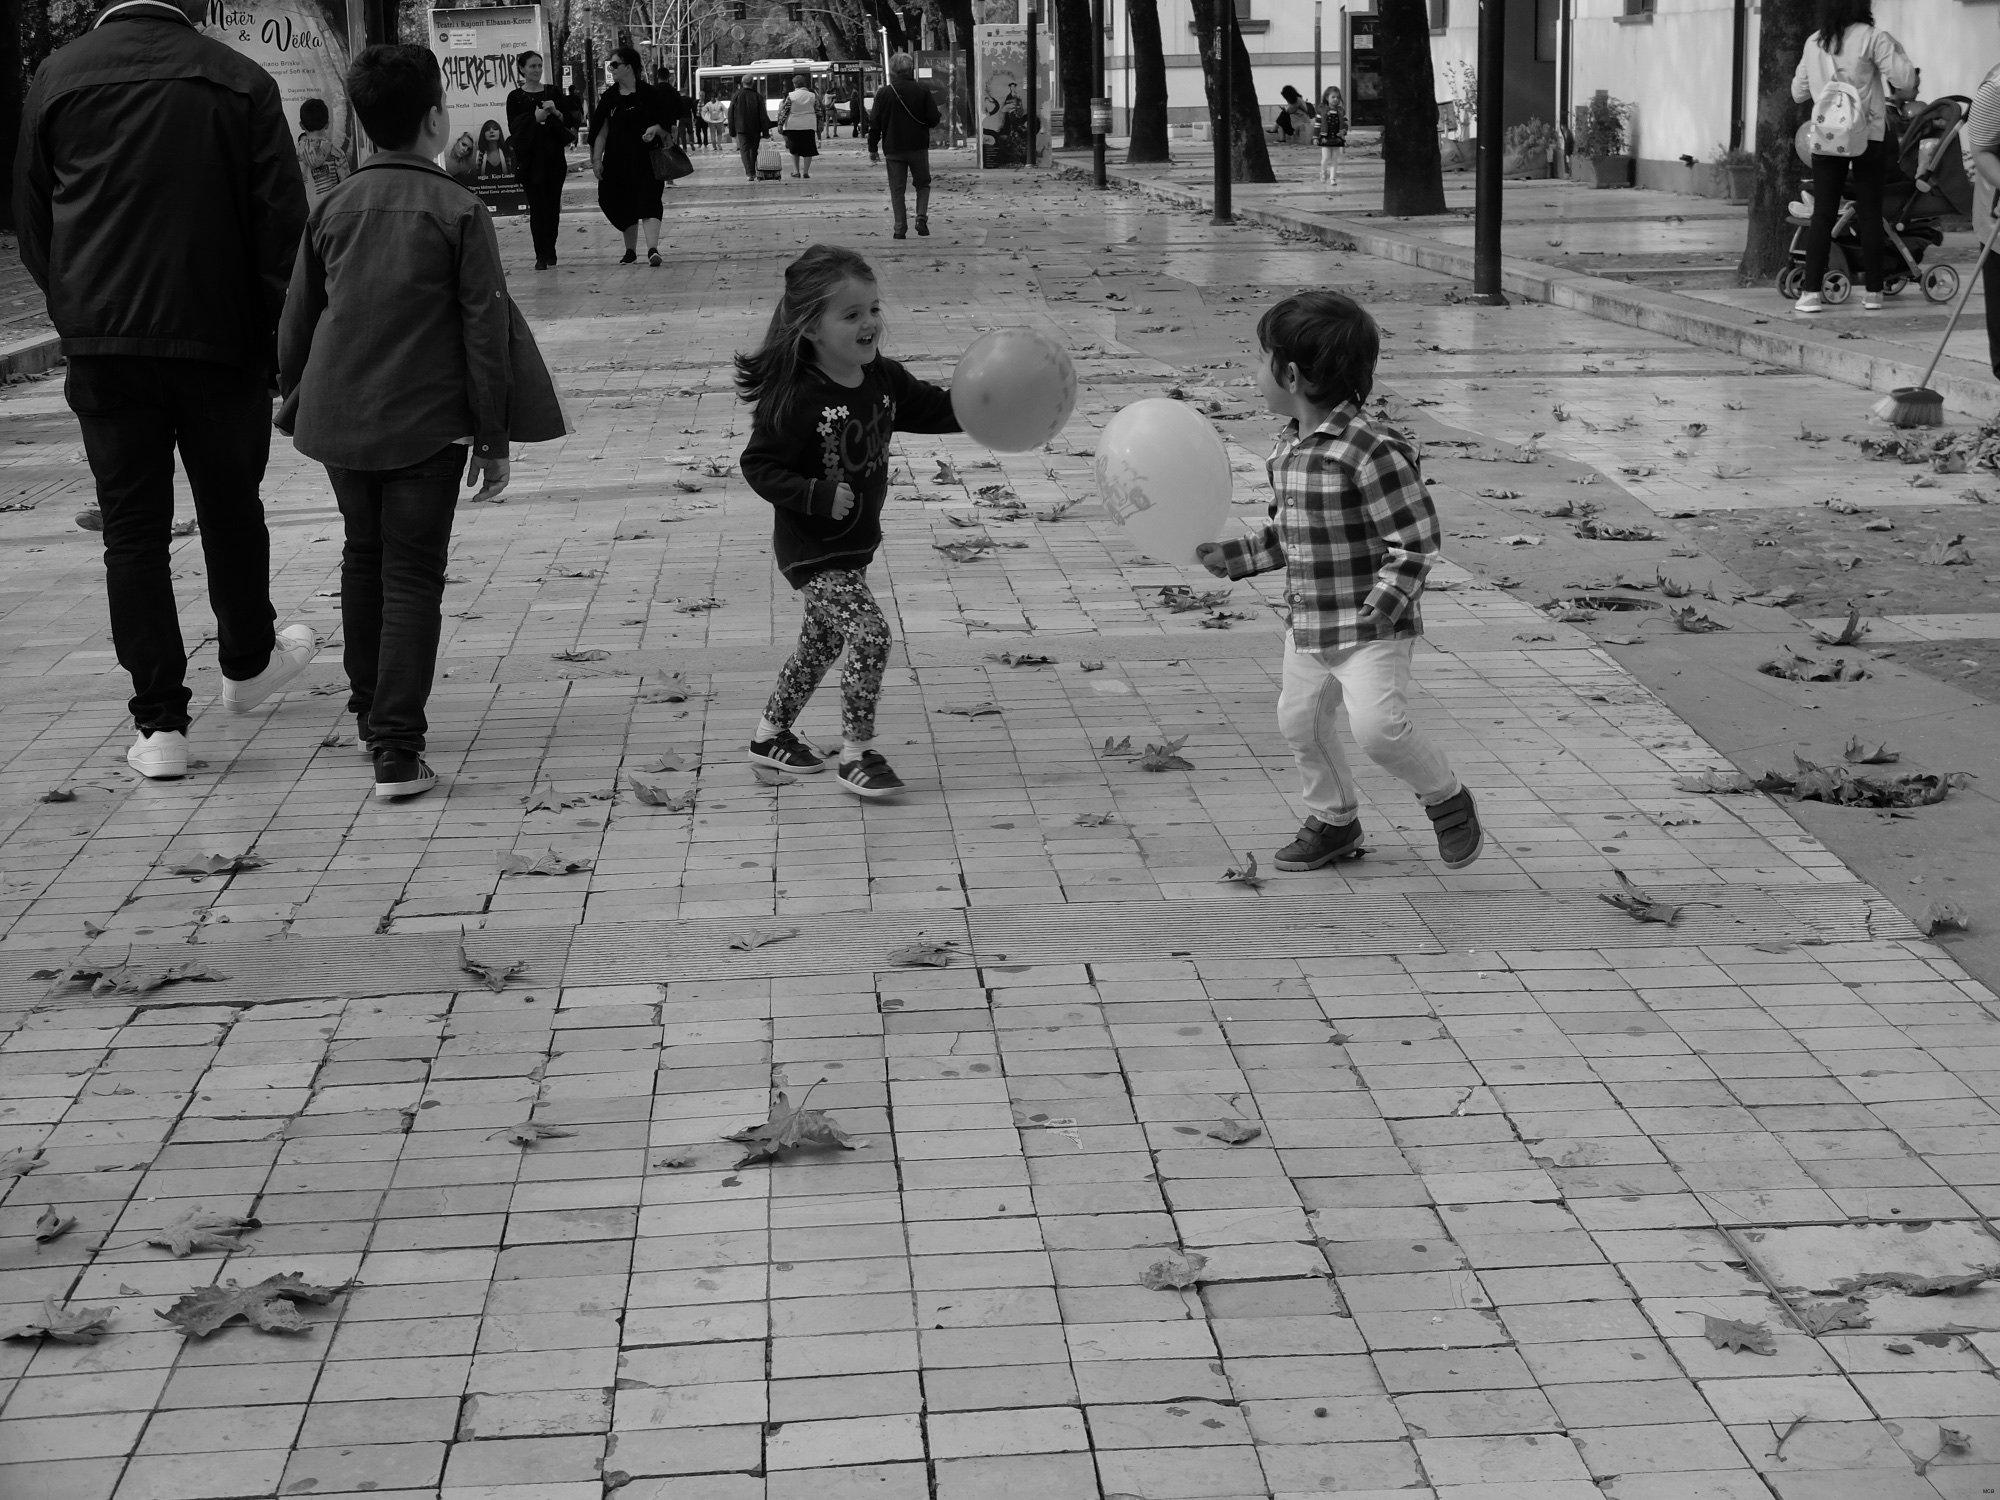 Mirush Bega, Tirana, 27 octobre 2019